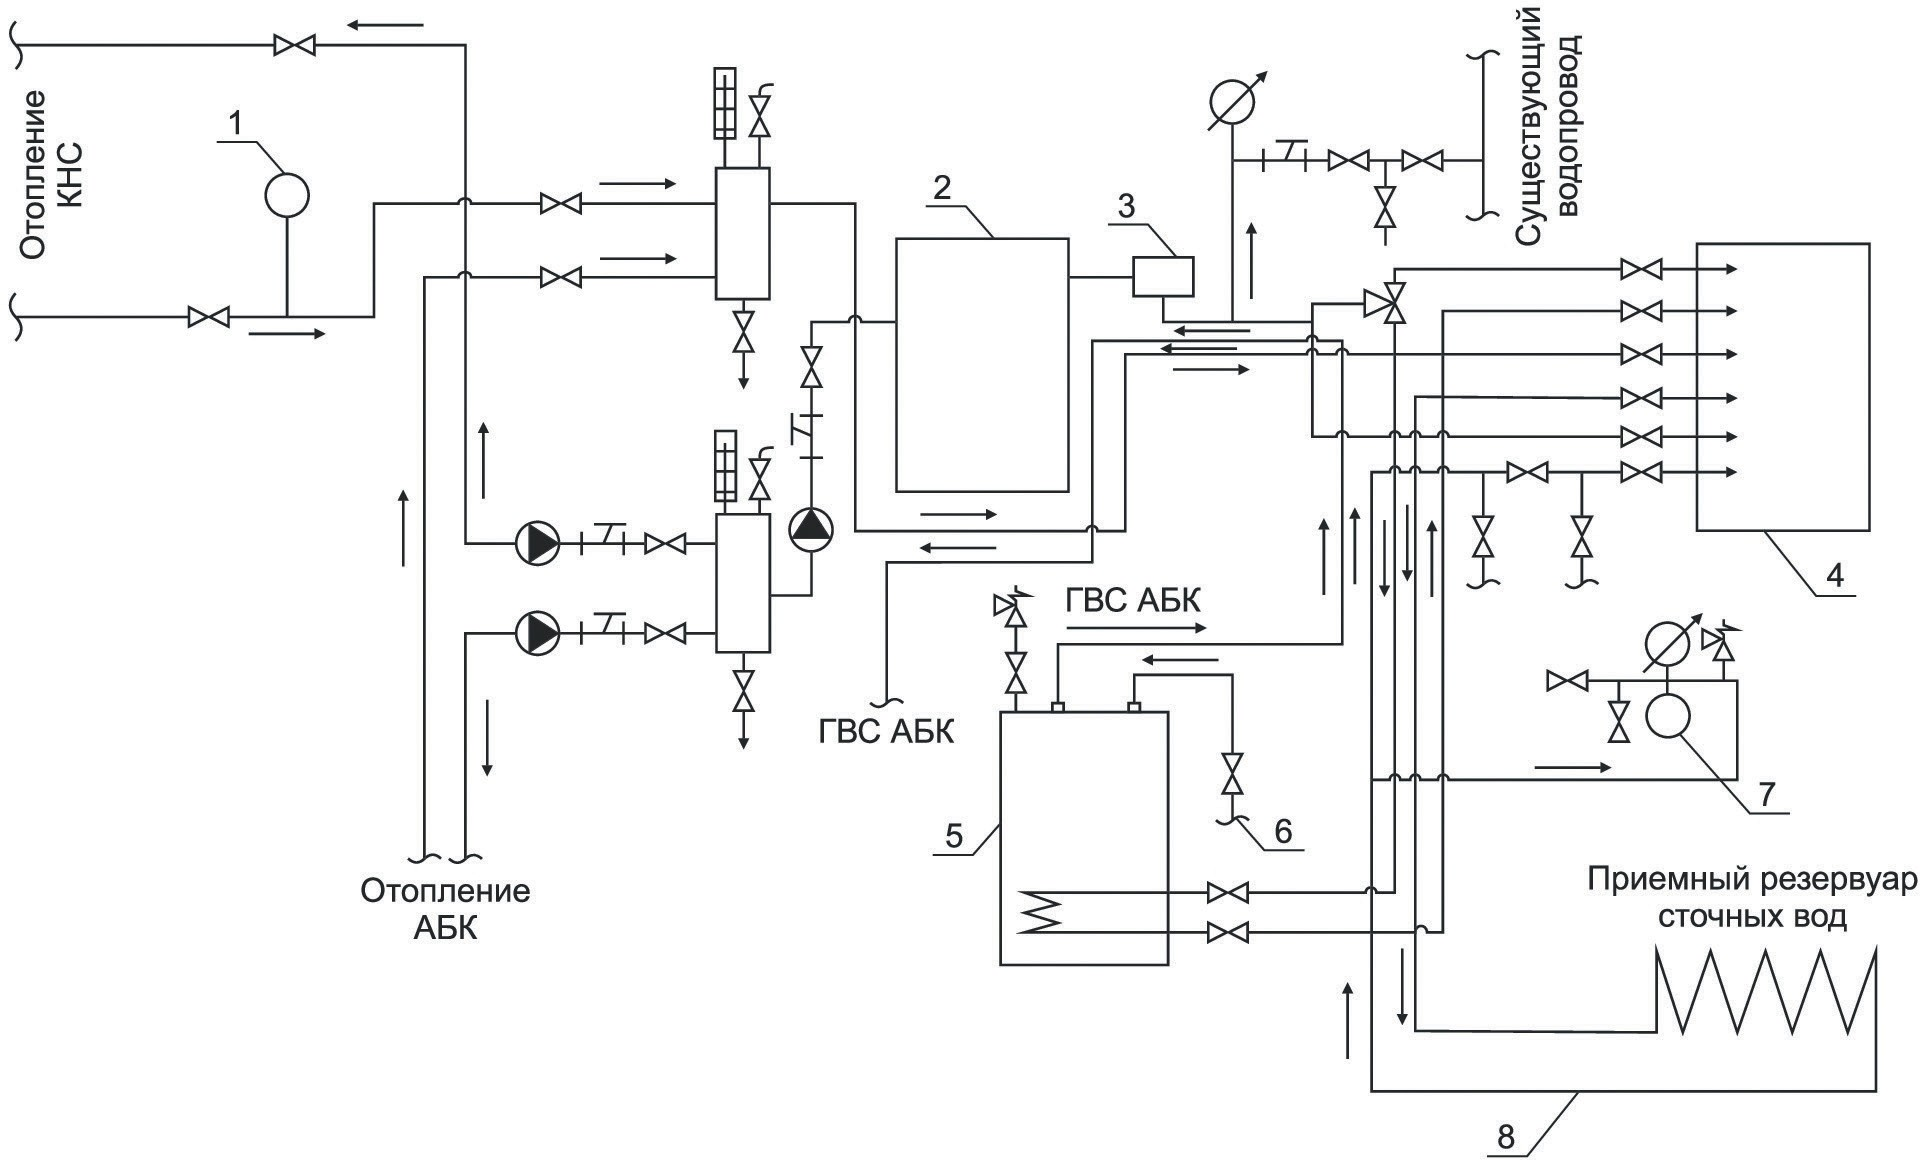 схема теплового узла КНс-3